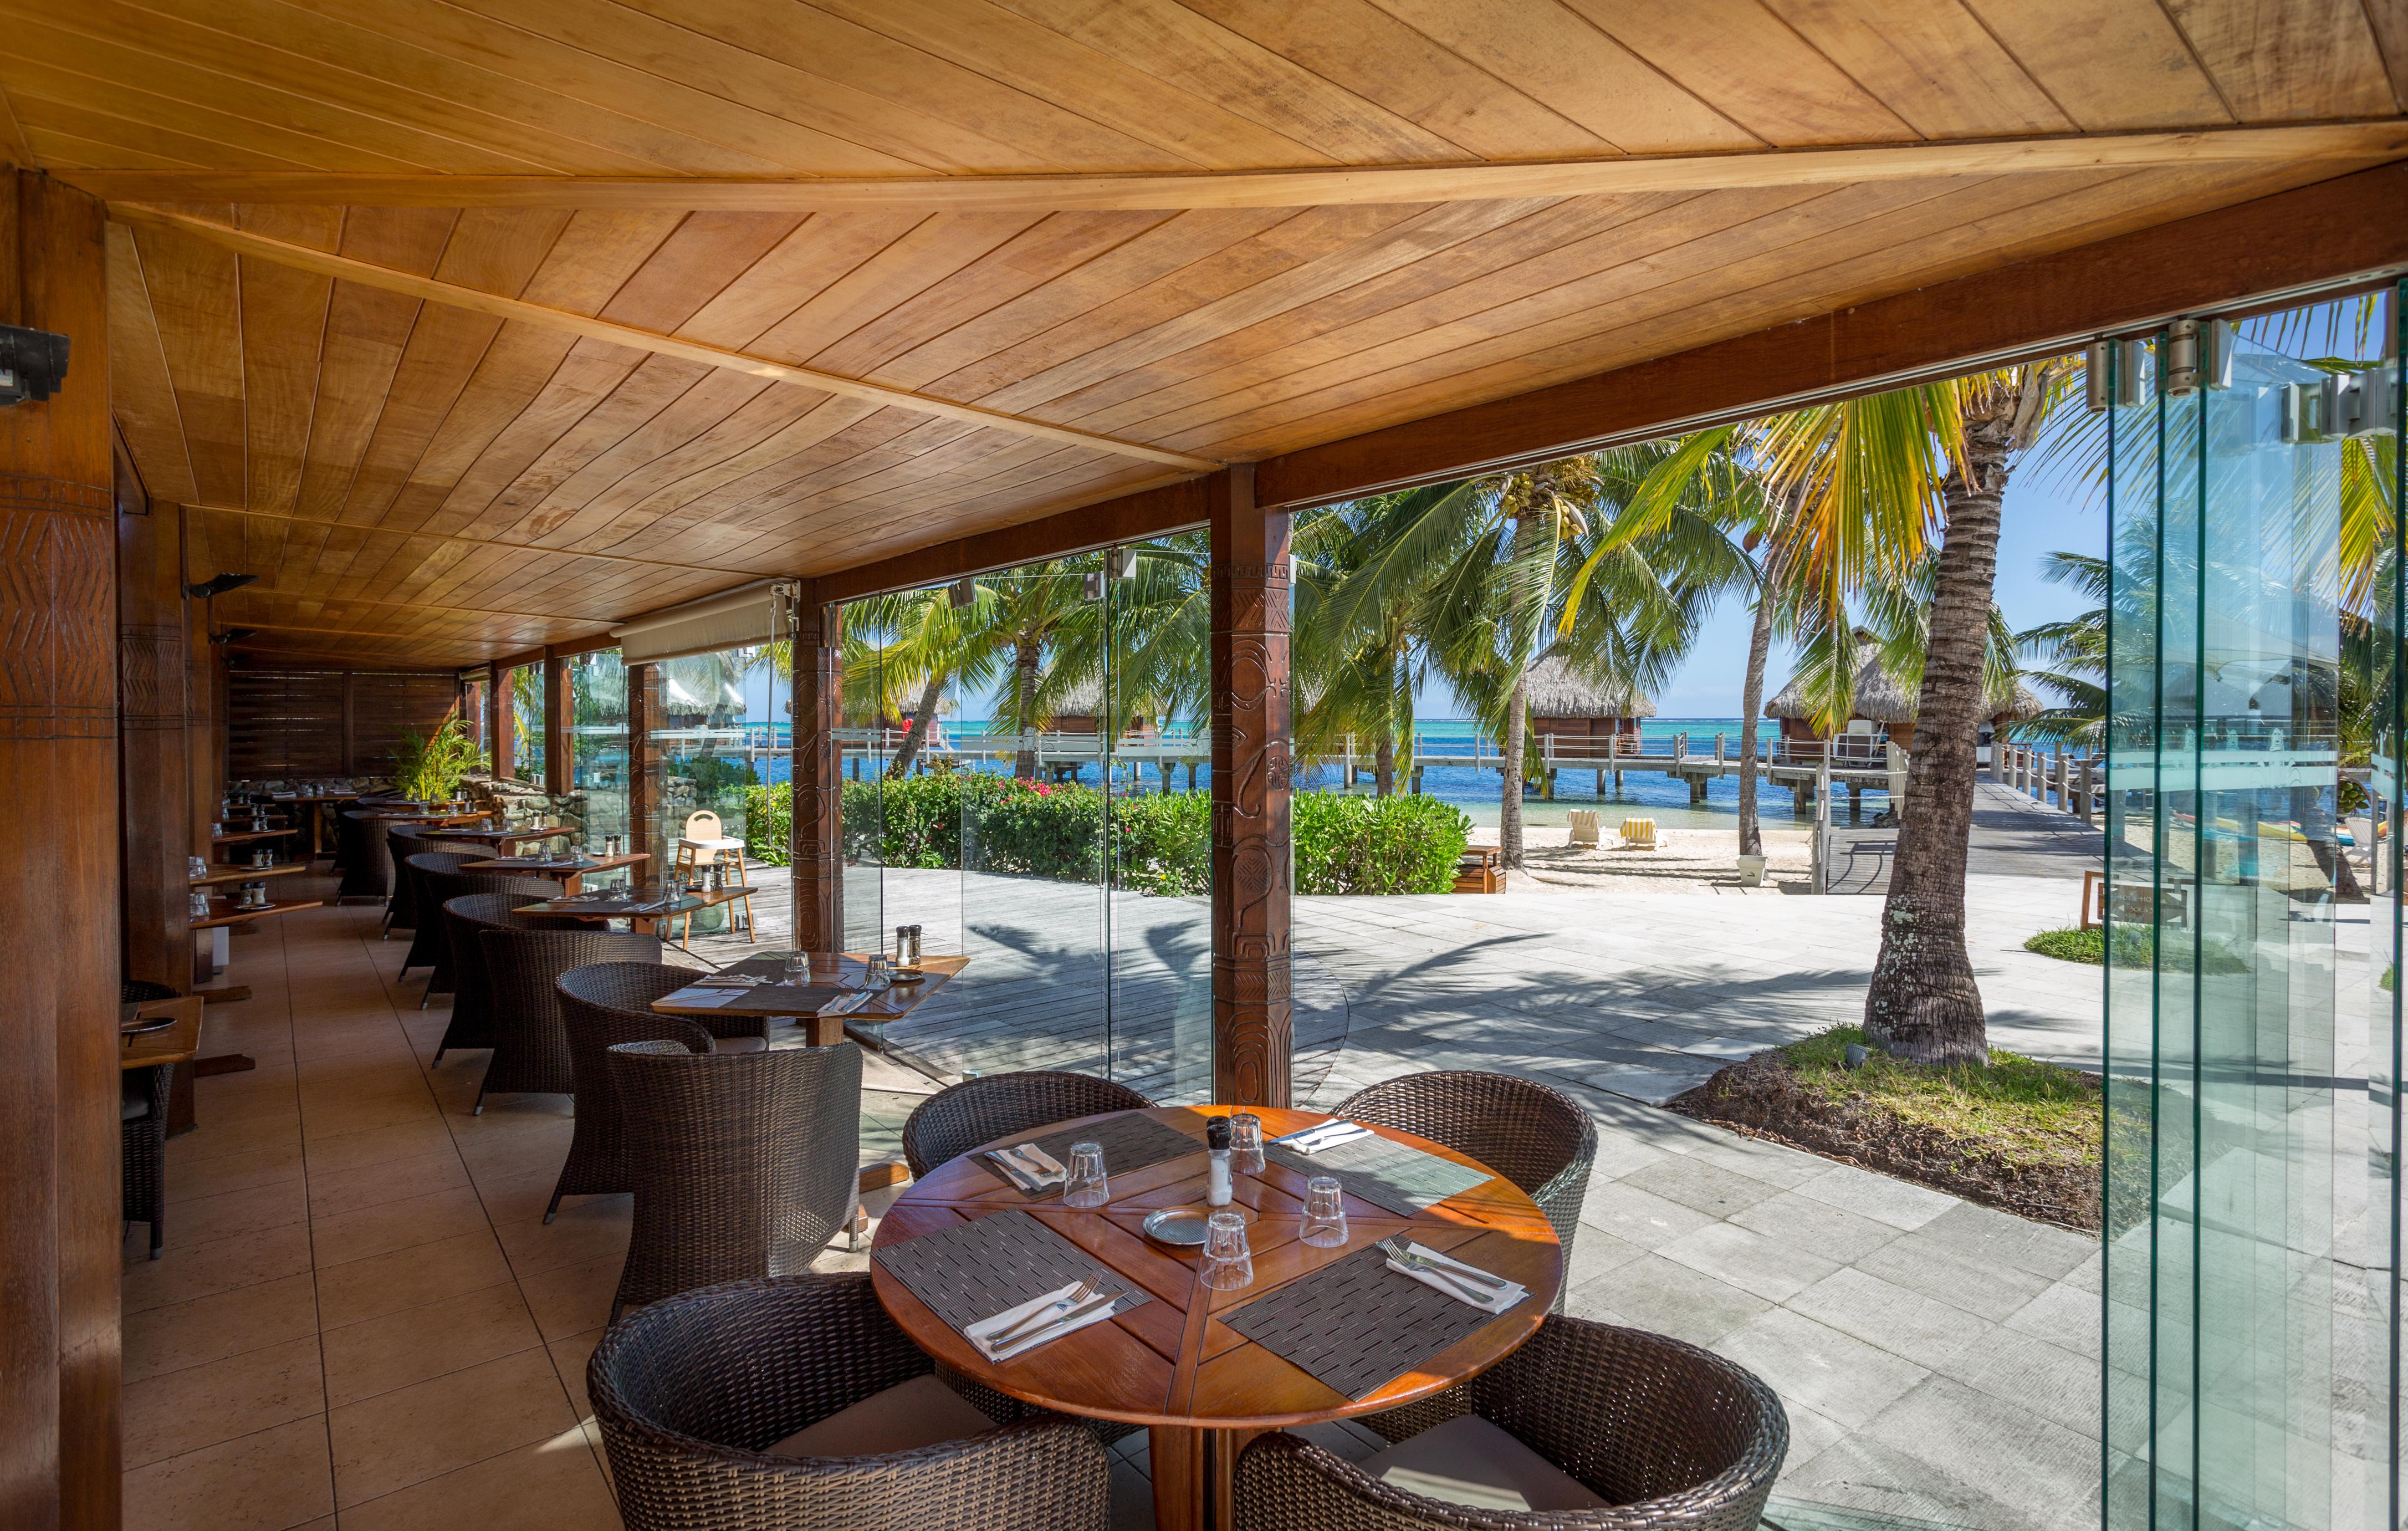 https://tahititourisme.it/wp-content/uploads/2018/03/RESTAURATION-Restaurant-Mahanai-1-Charles_Veronese.jpg